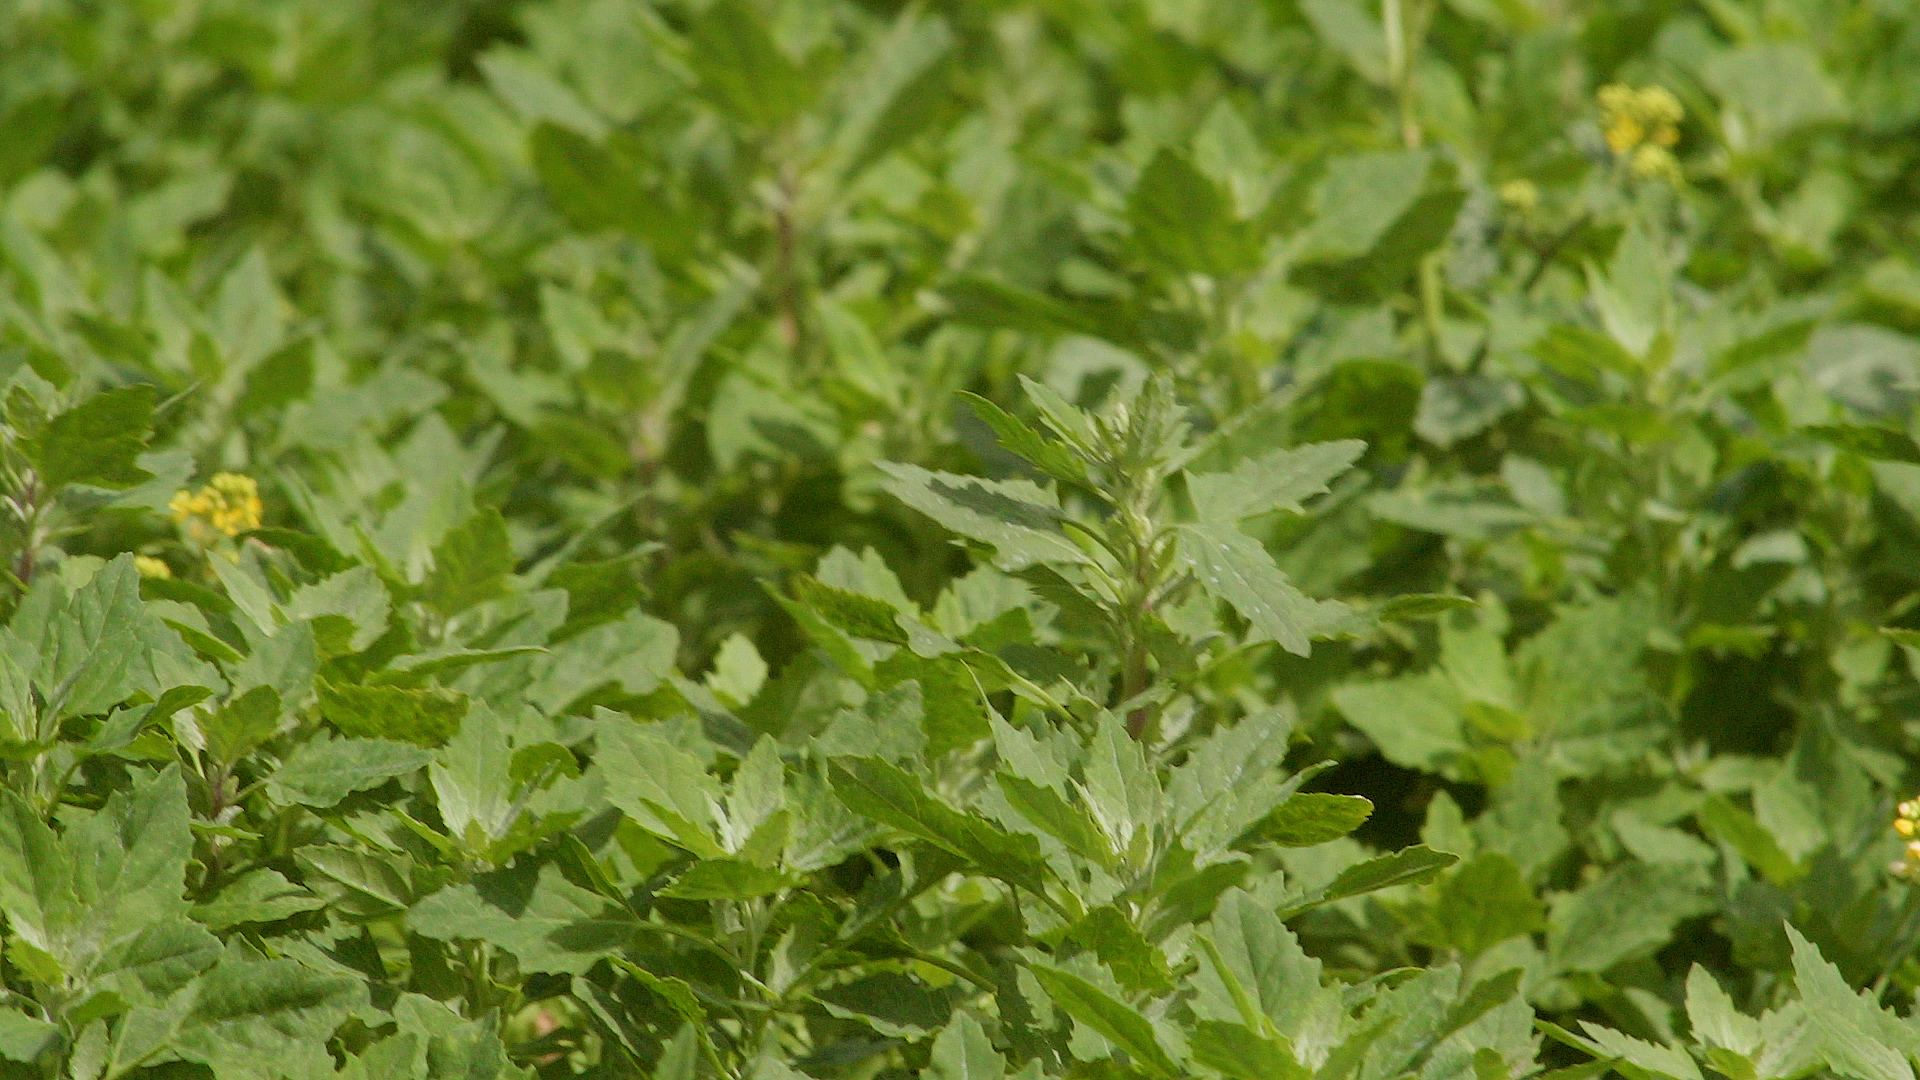 Targeting beet inputs towards crop performance